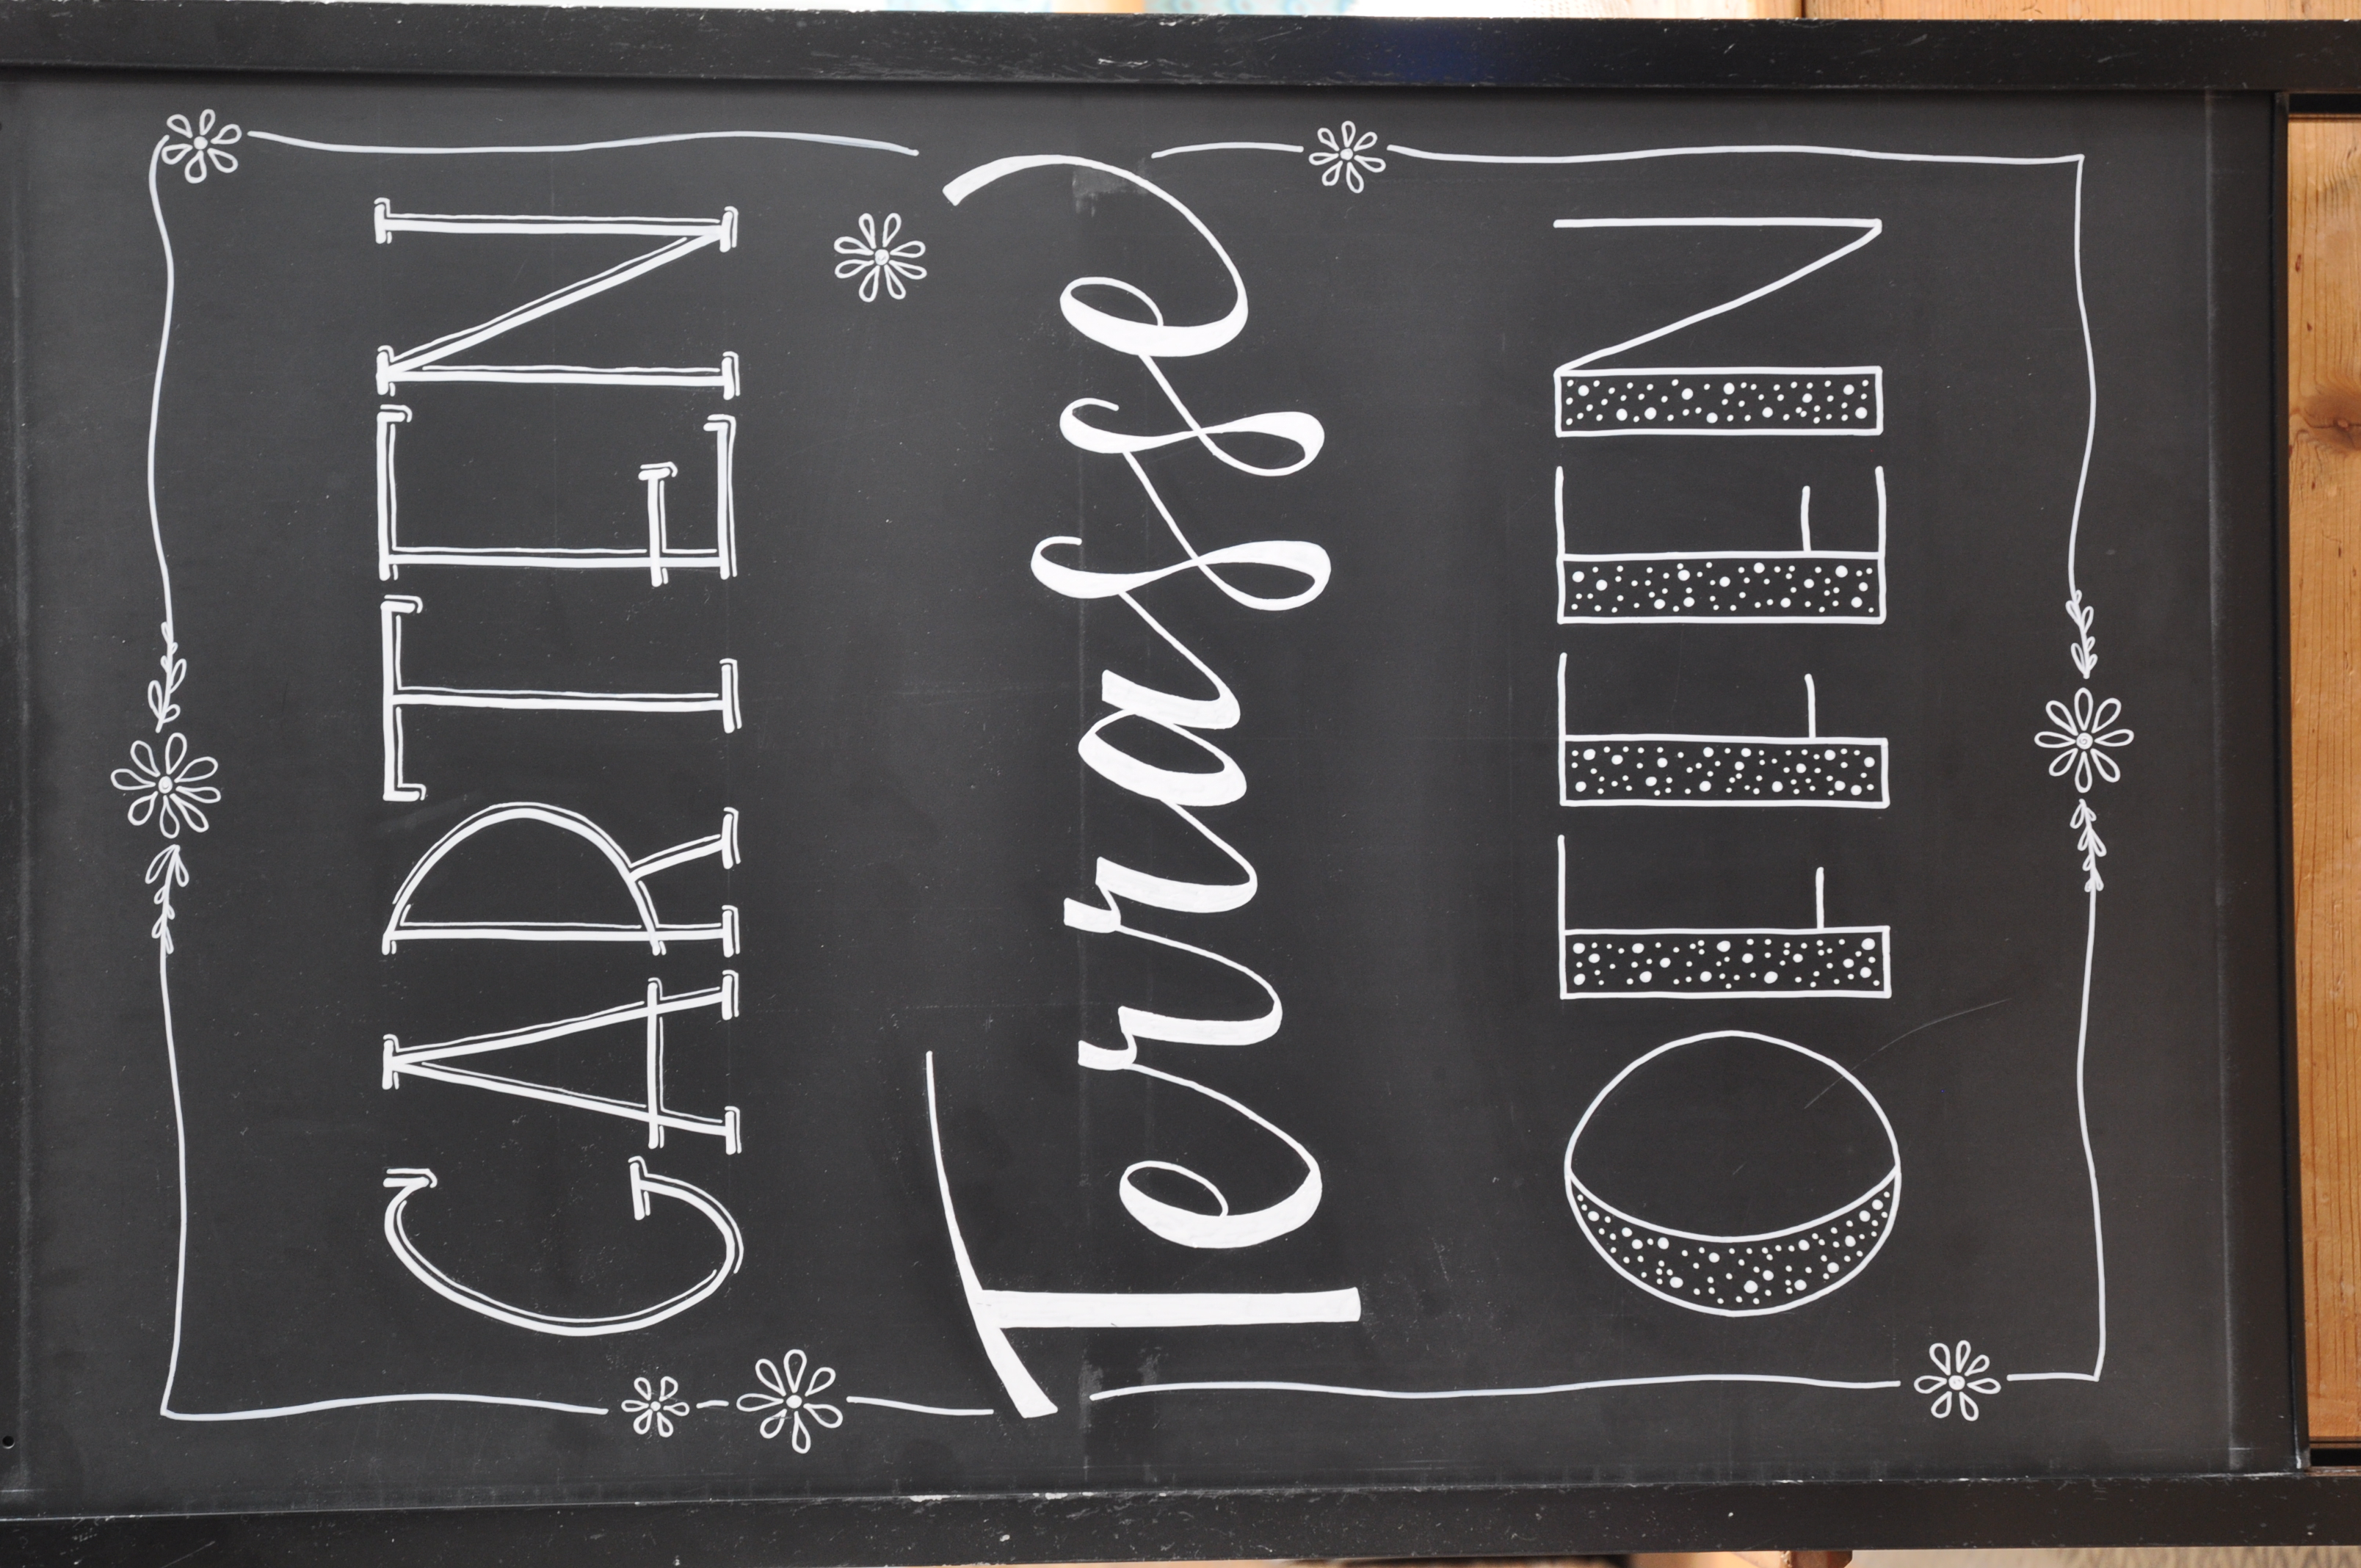 Kundenstopper Gartenterrasse1